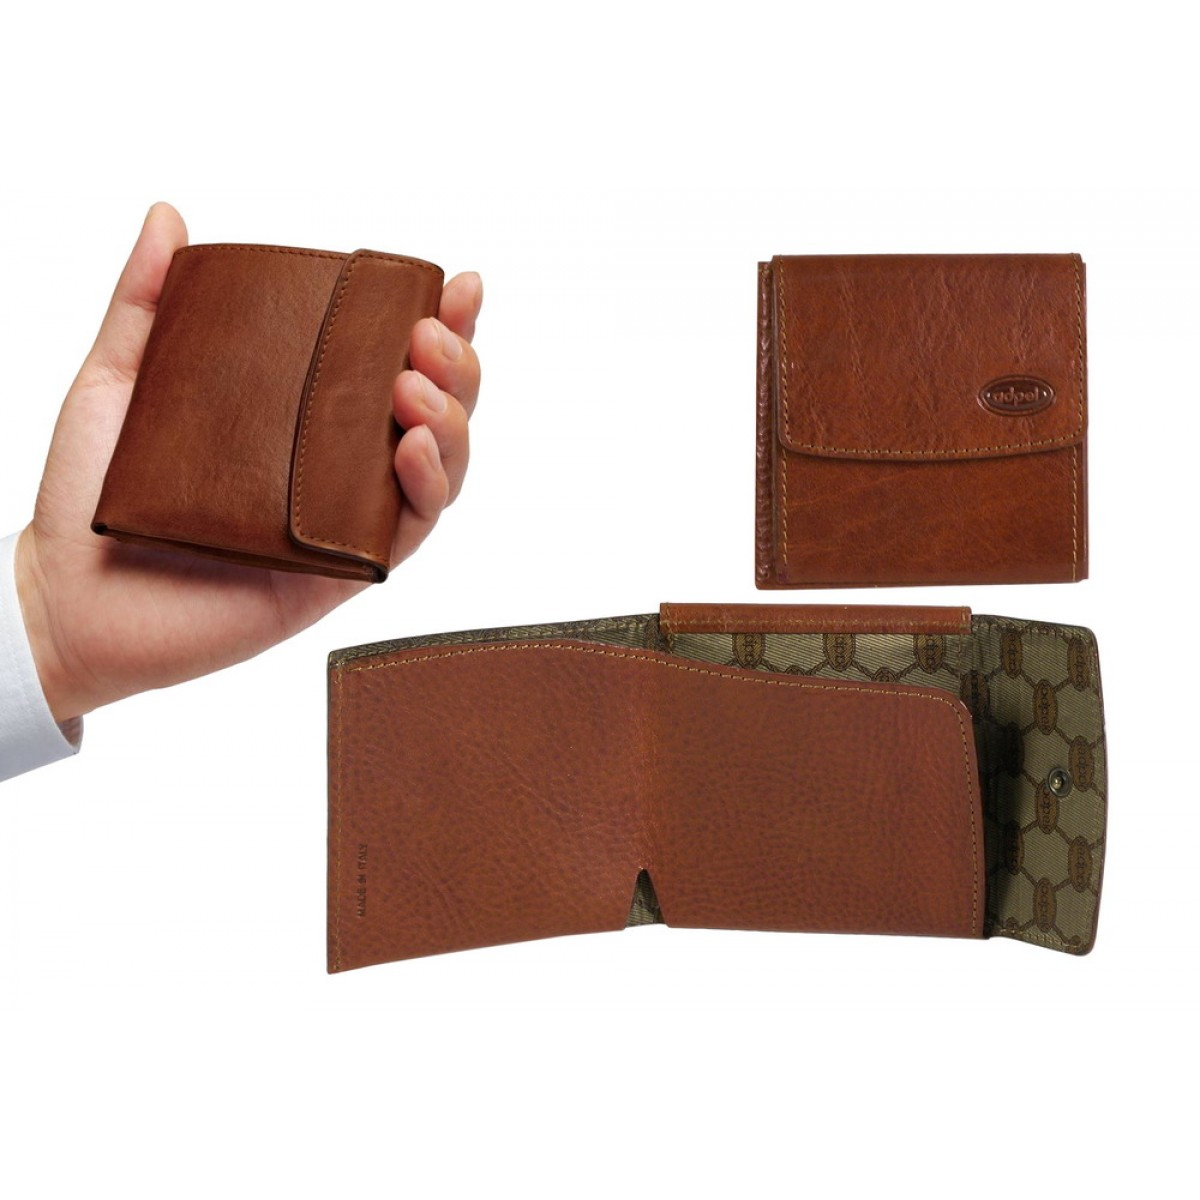 Portafoglio uomo minimalista con portamonete pelle for Portafoglio uomo